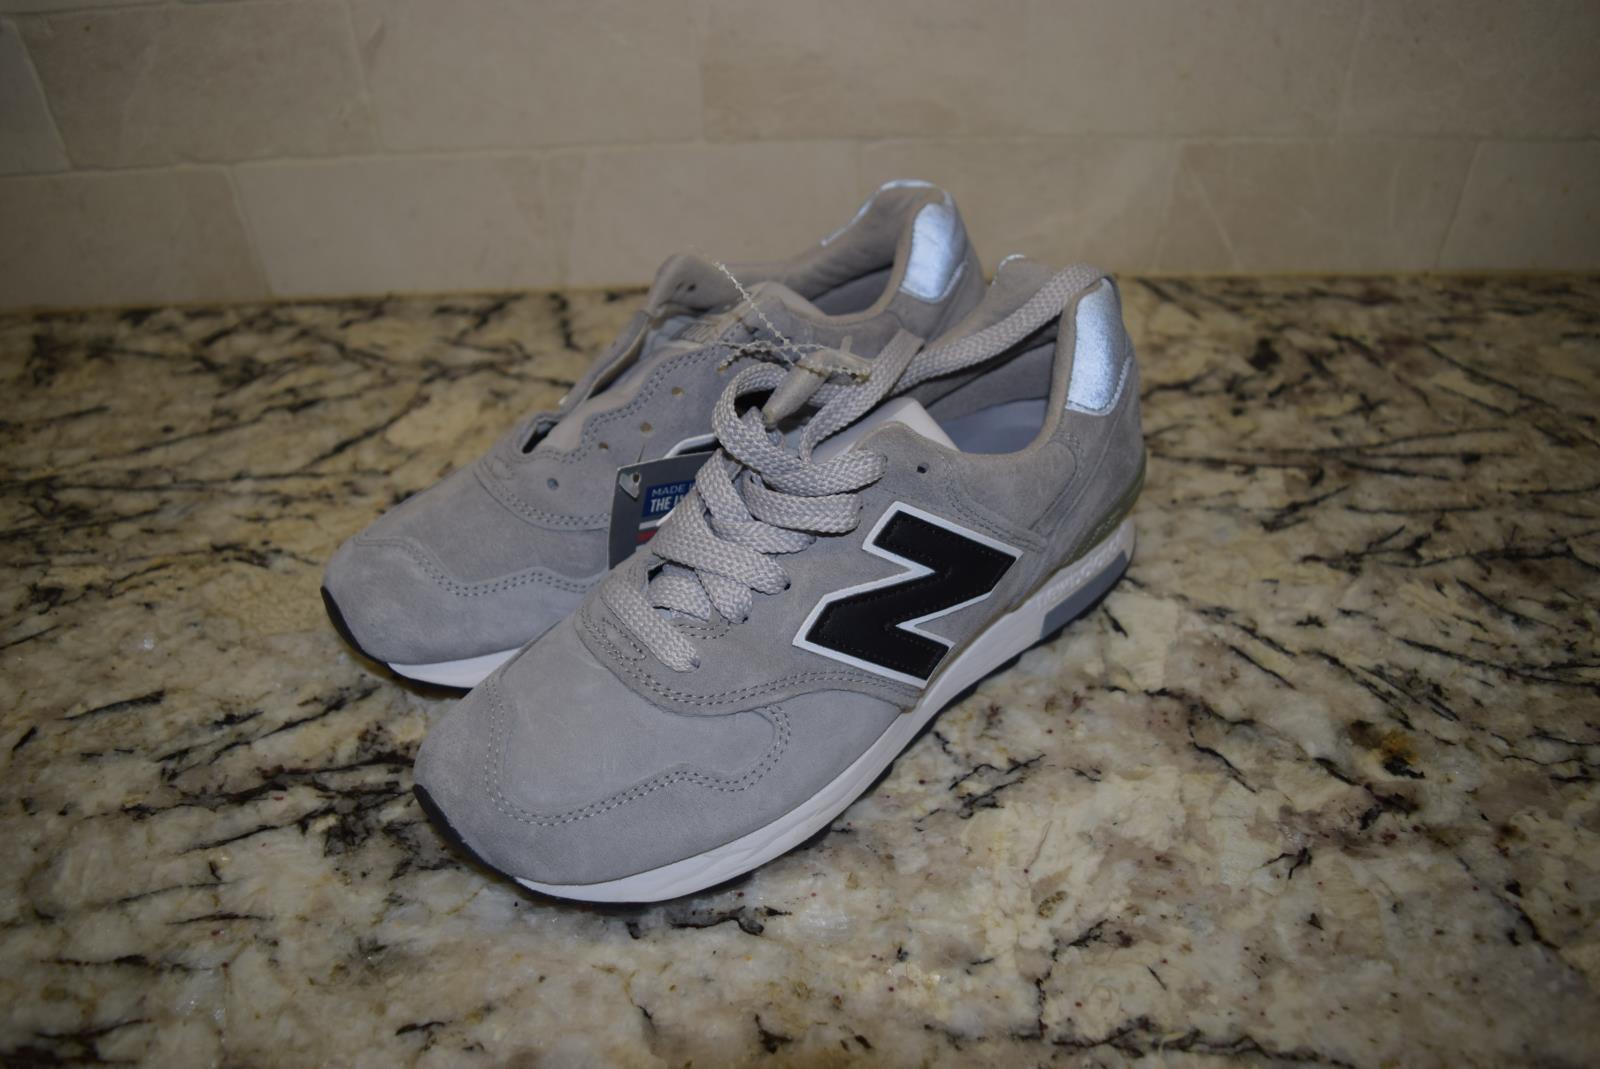 New Balance for JCrew Collab 170 1400 Sneakers Sz 6.5 Raw Steel Grey 35251